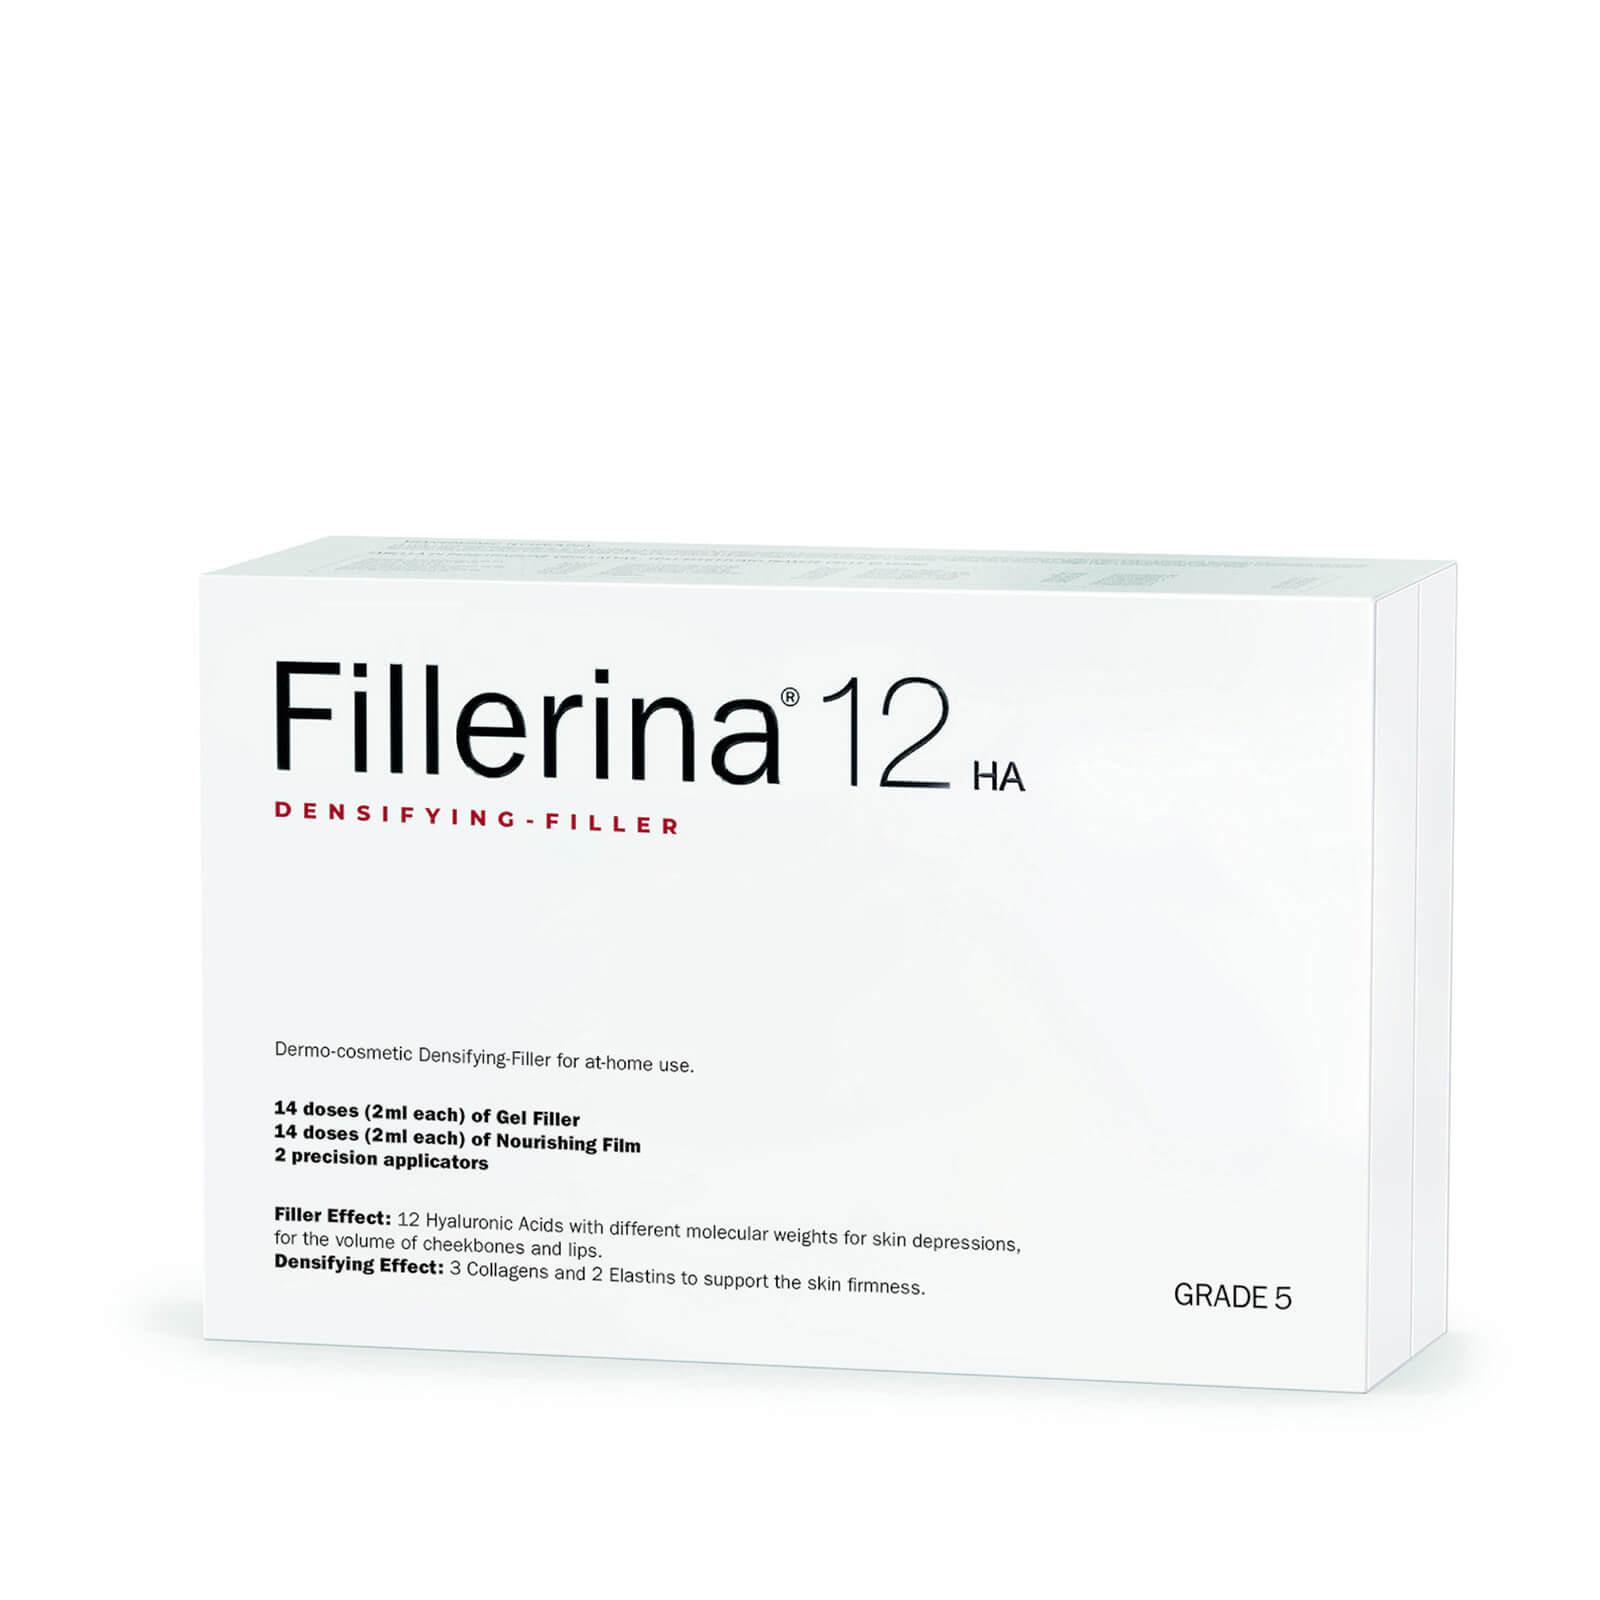 Image of Fillerina 12 Densifying-Filler Intensive Filler Treatment - Grade 5 2 x 30ml